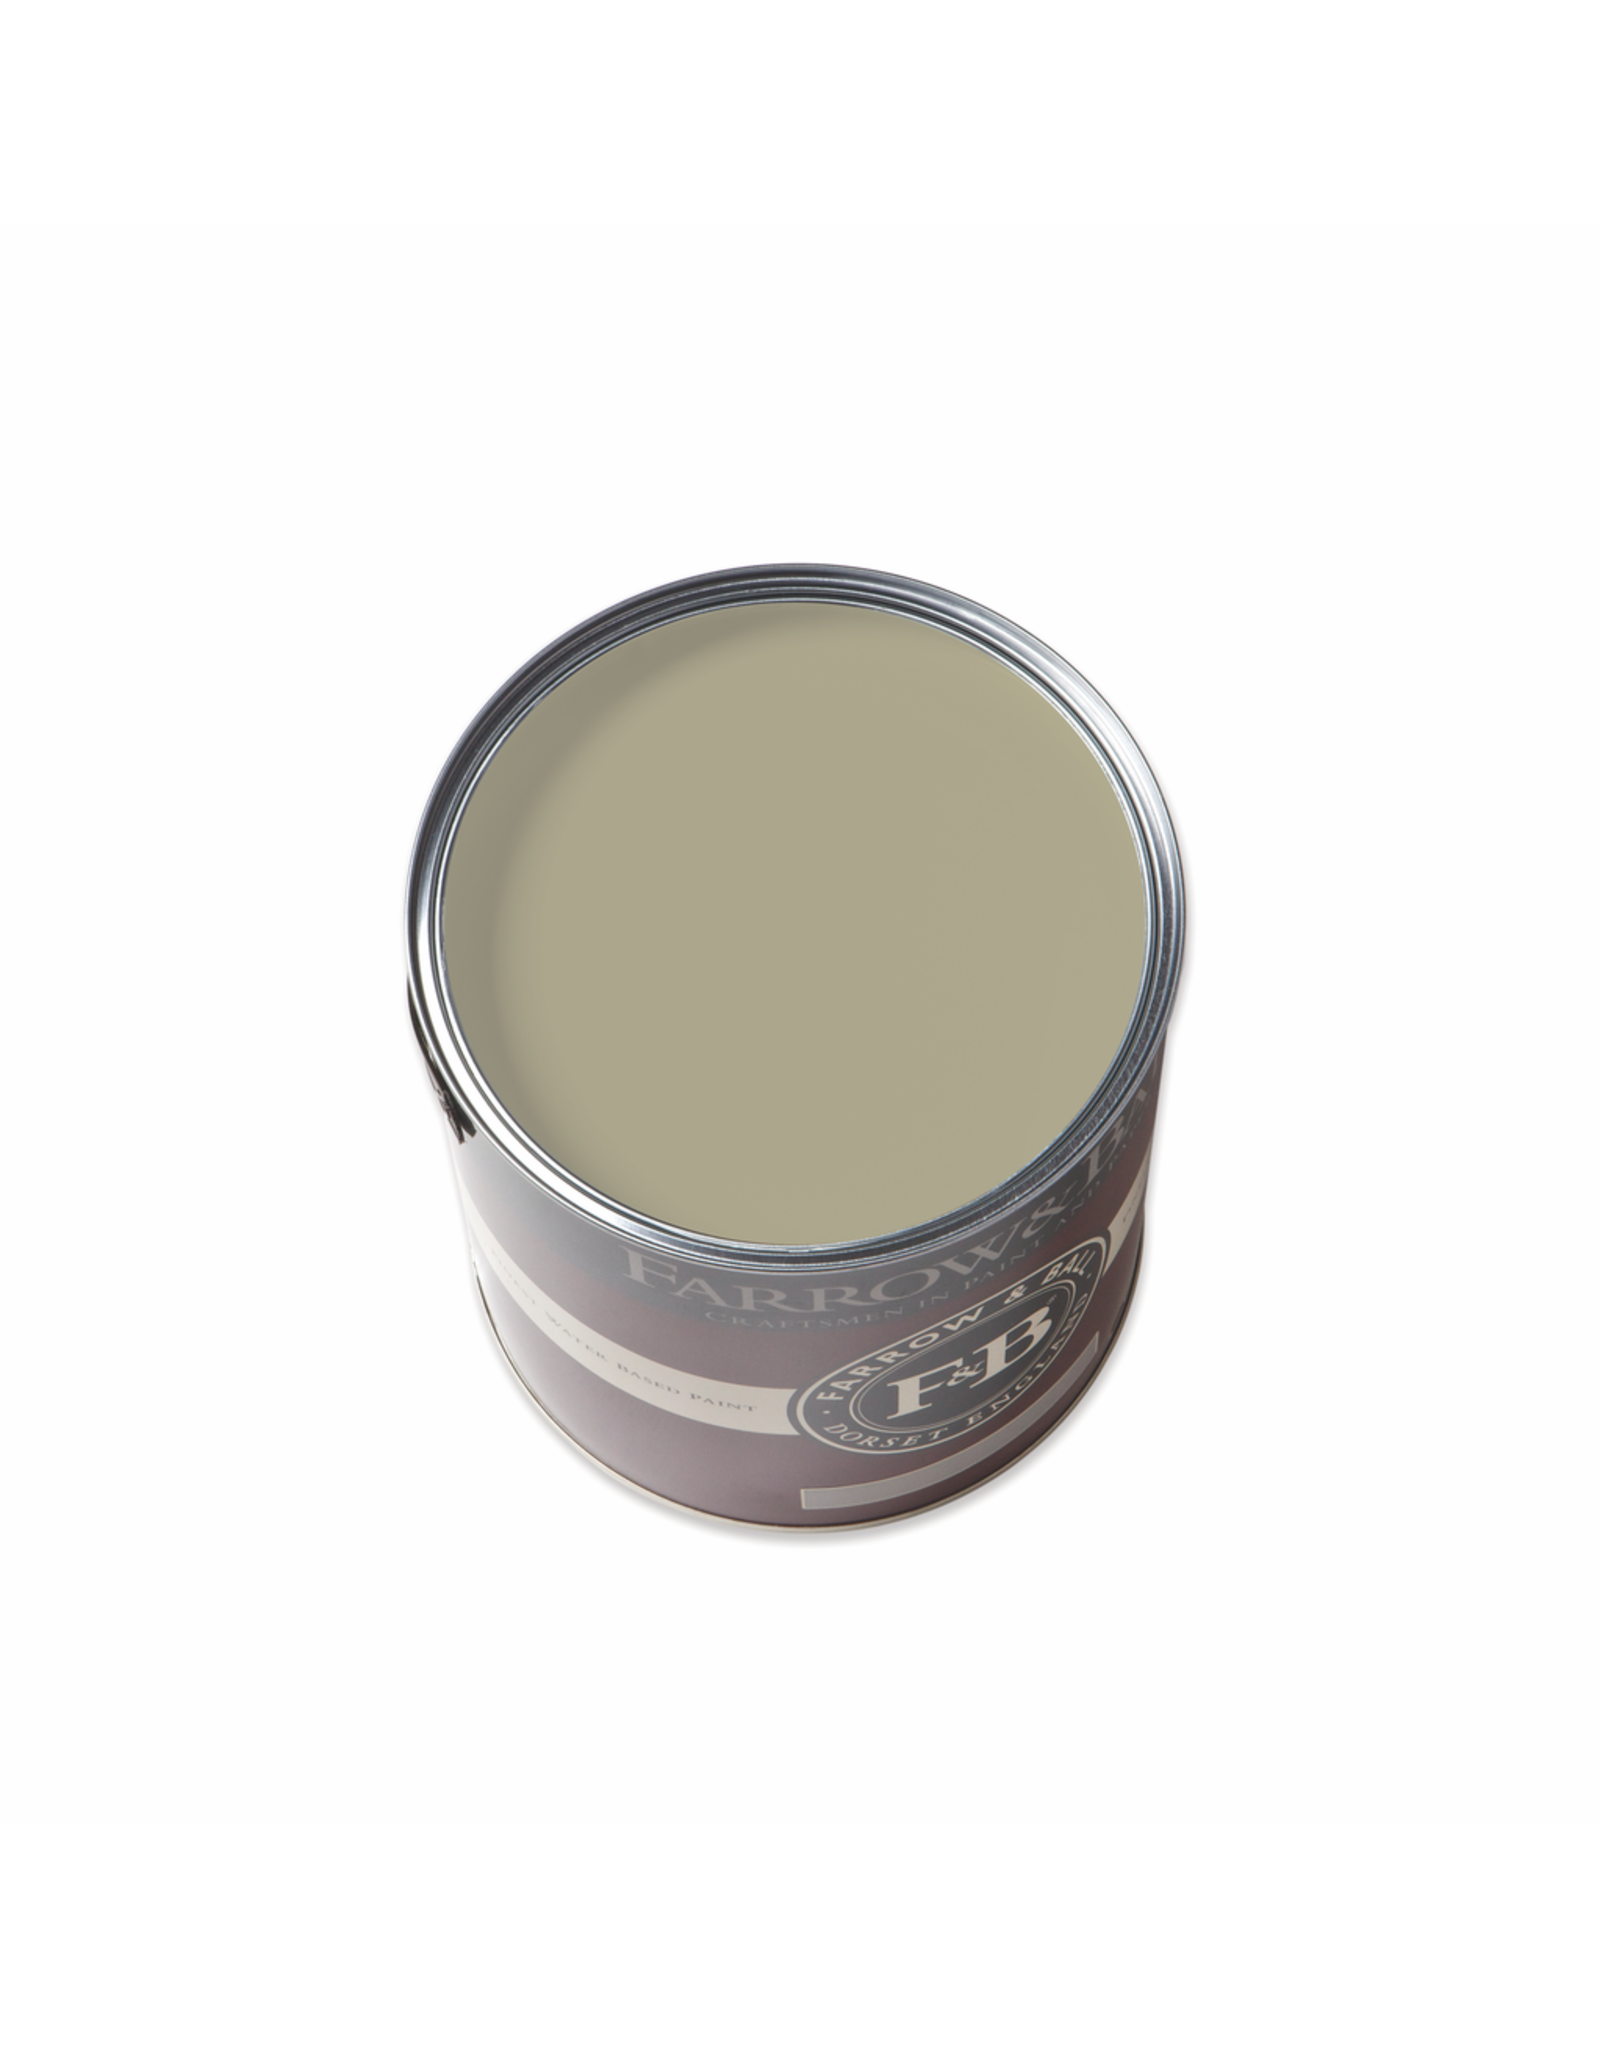 Farrow and Ball Gallon Modern Emulsion Stone White No. 11